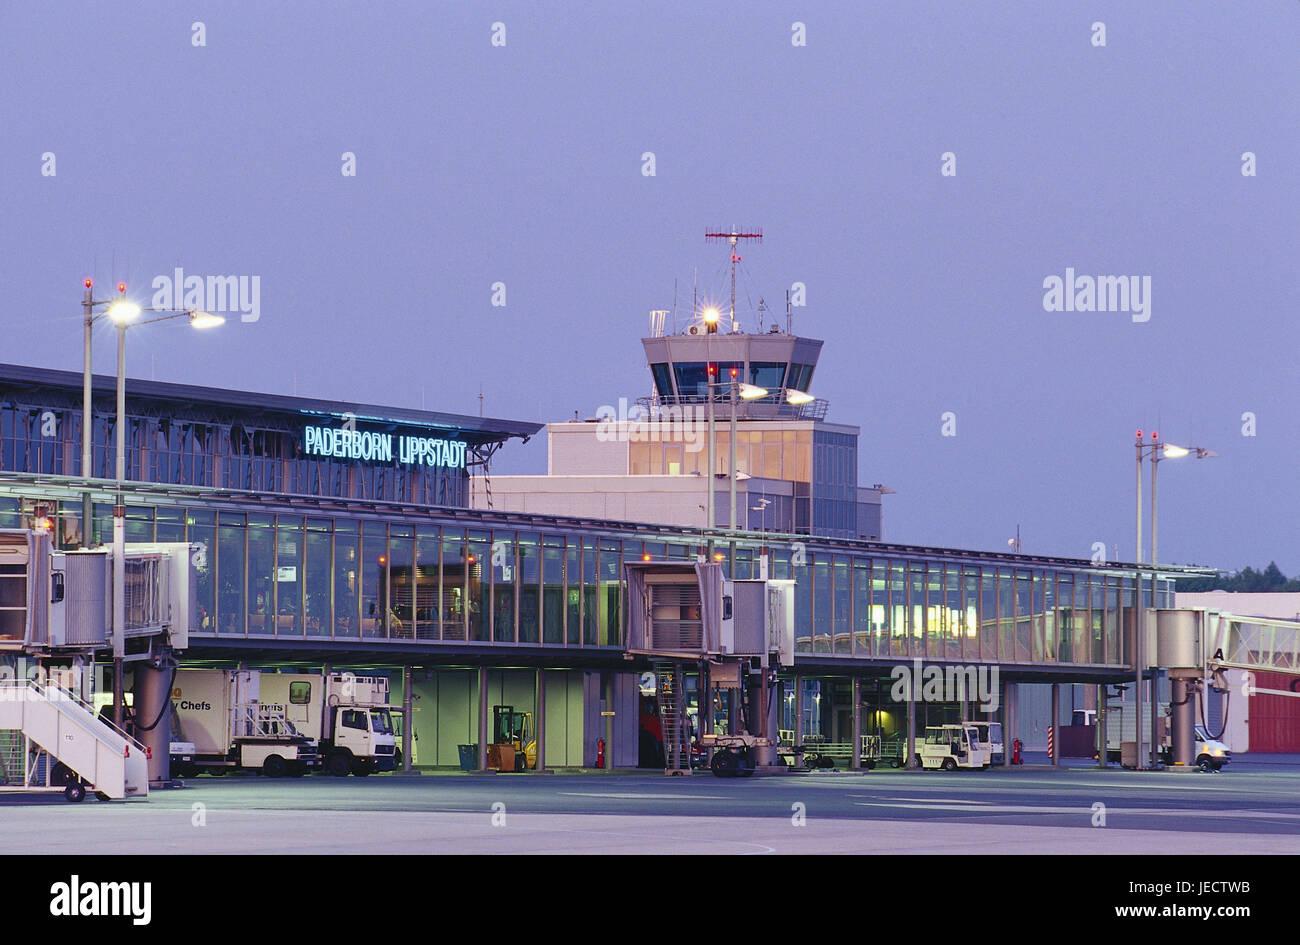 Germany, North Rhine-Westphalia, Paderborn-Lippstadt, airport, dusk, Teutoburger wood, Paderborn, Lippstadt, air - Stock Image